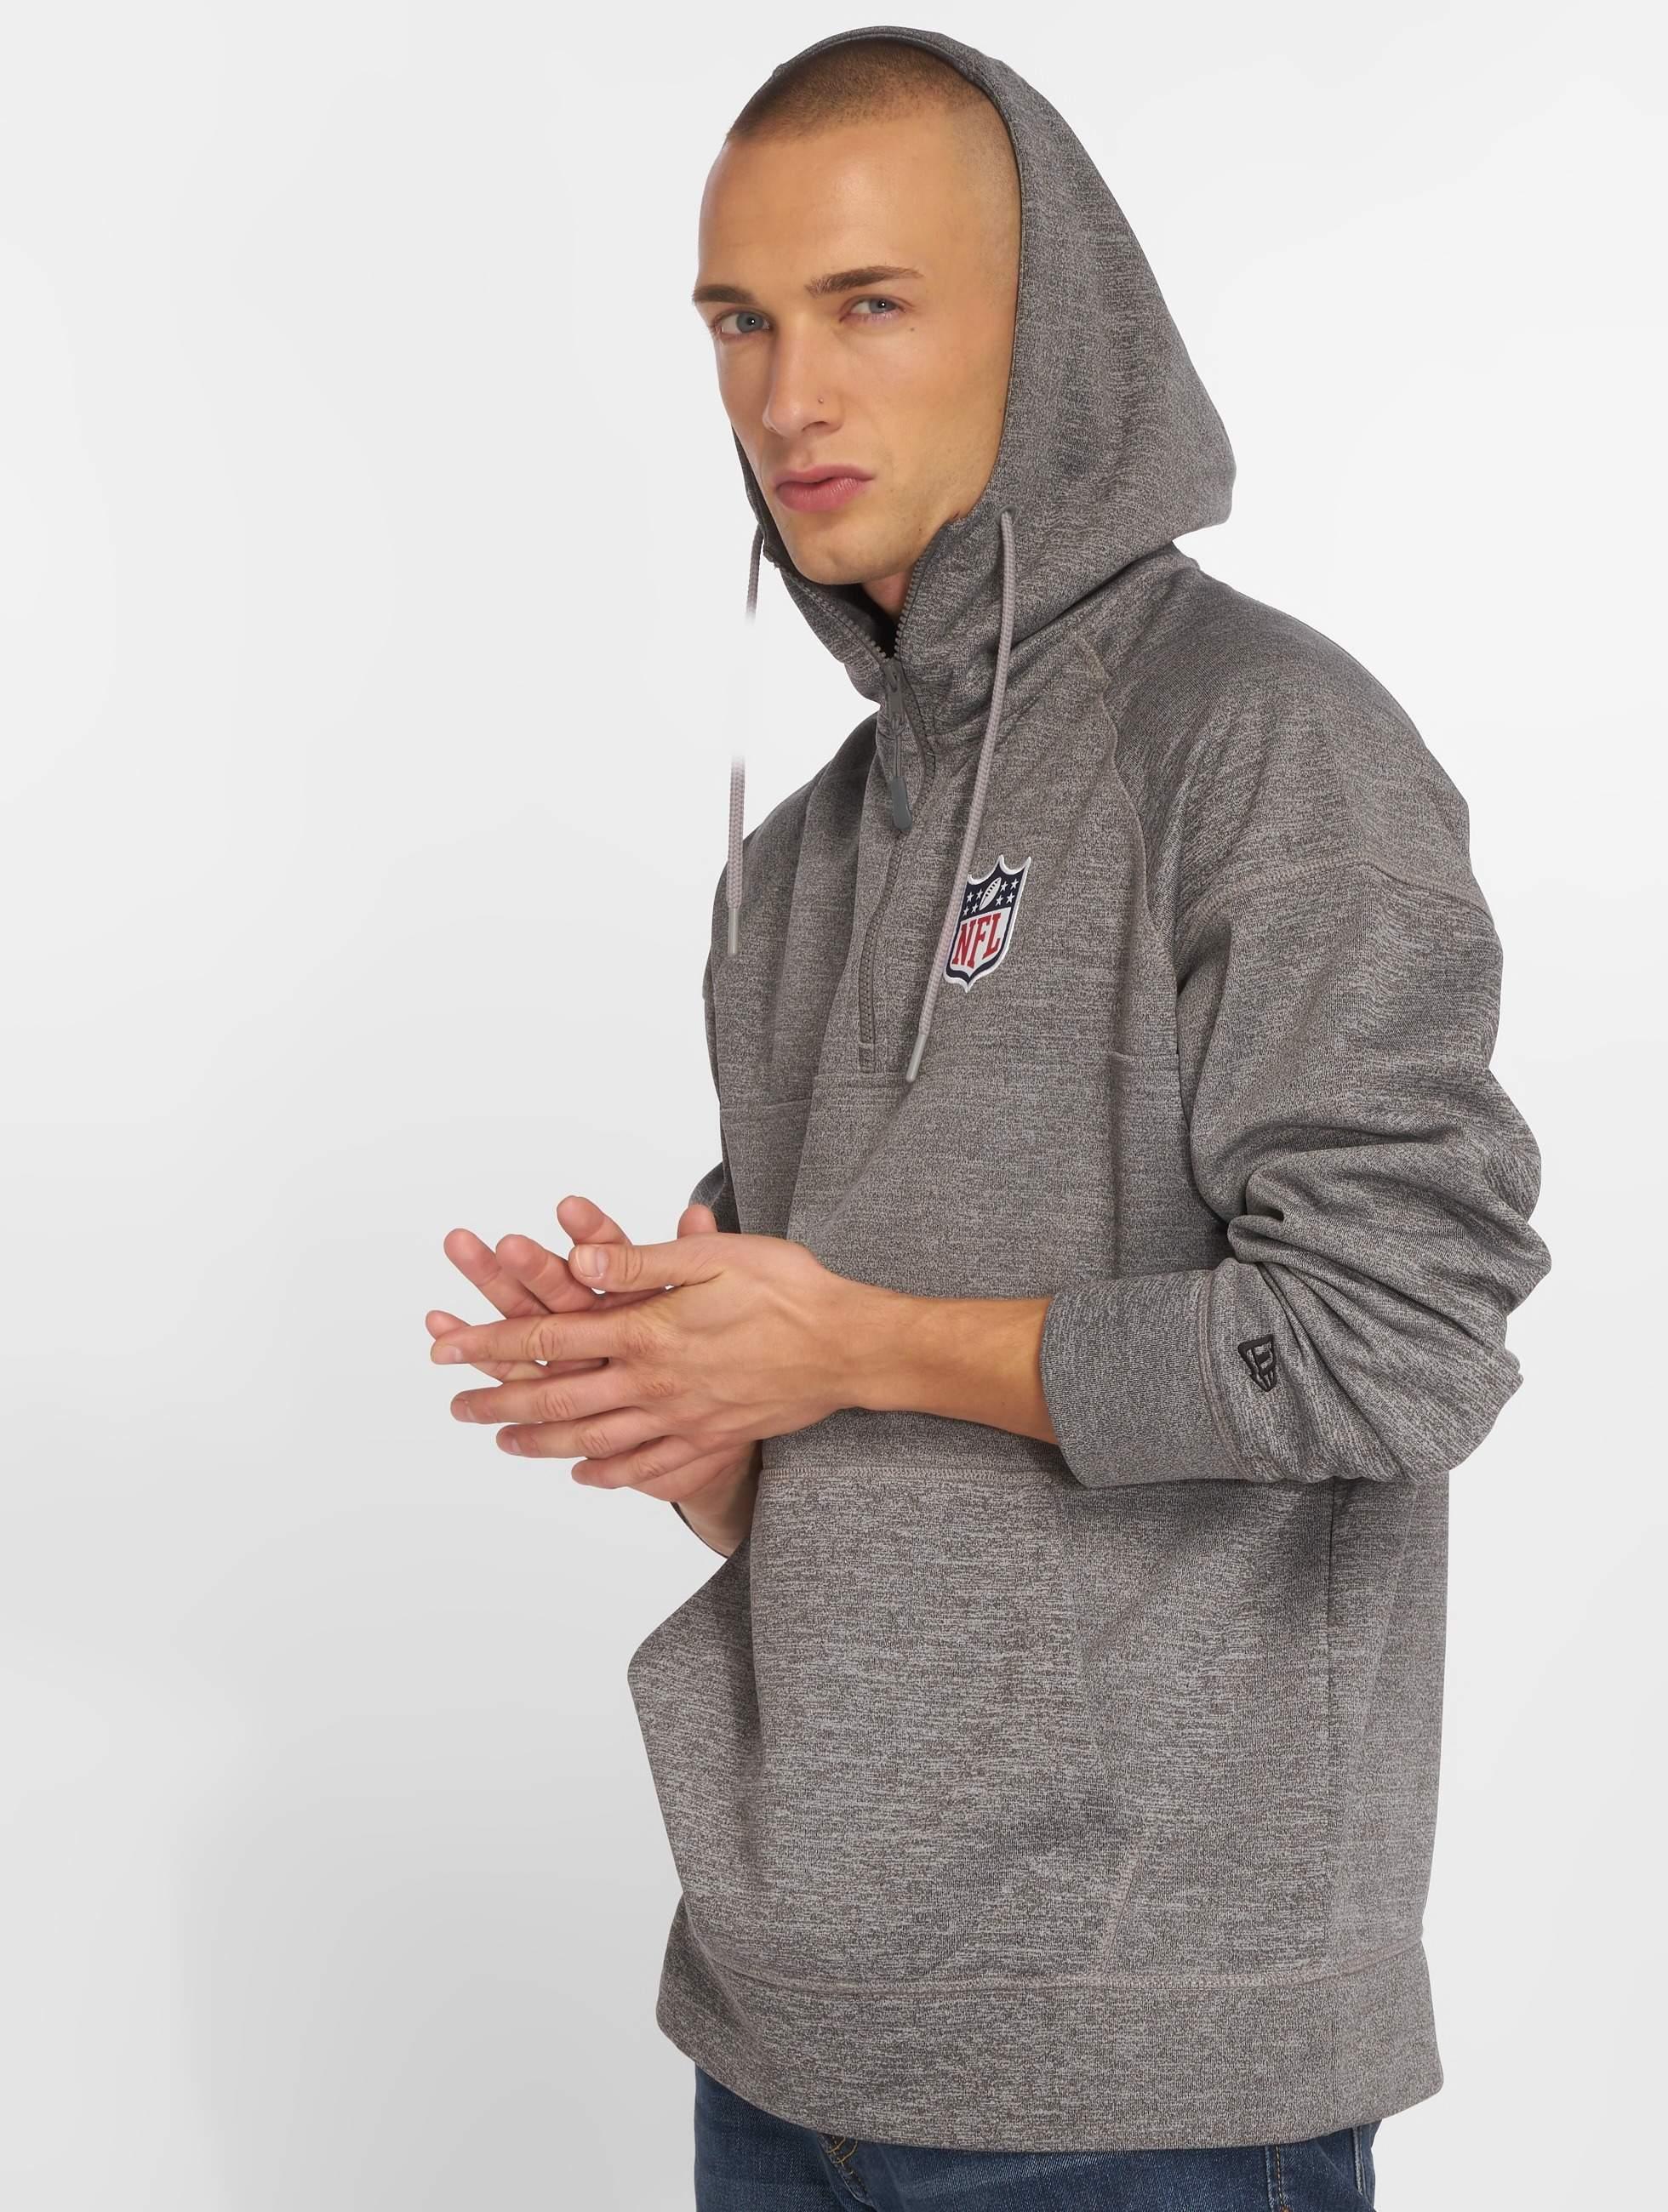 73162b63470b New Era Överdel / Hoodie NFL Jersey i grå 532353